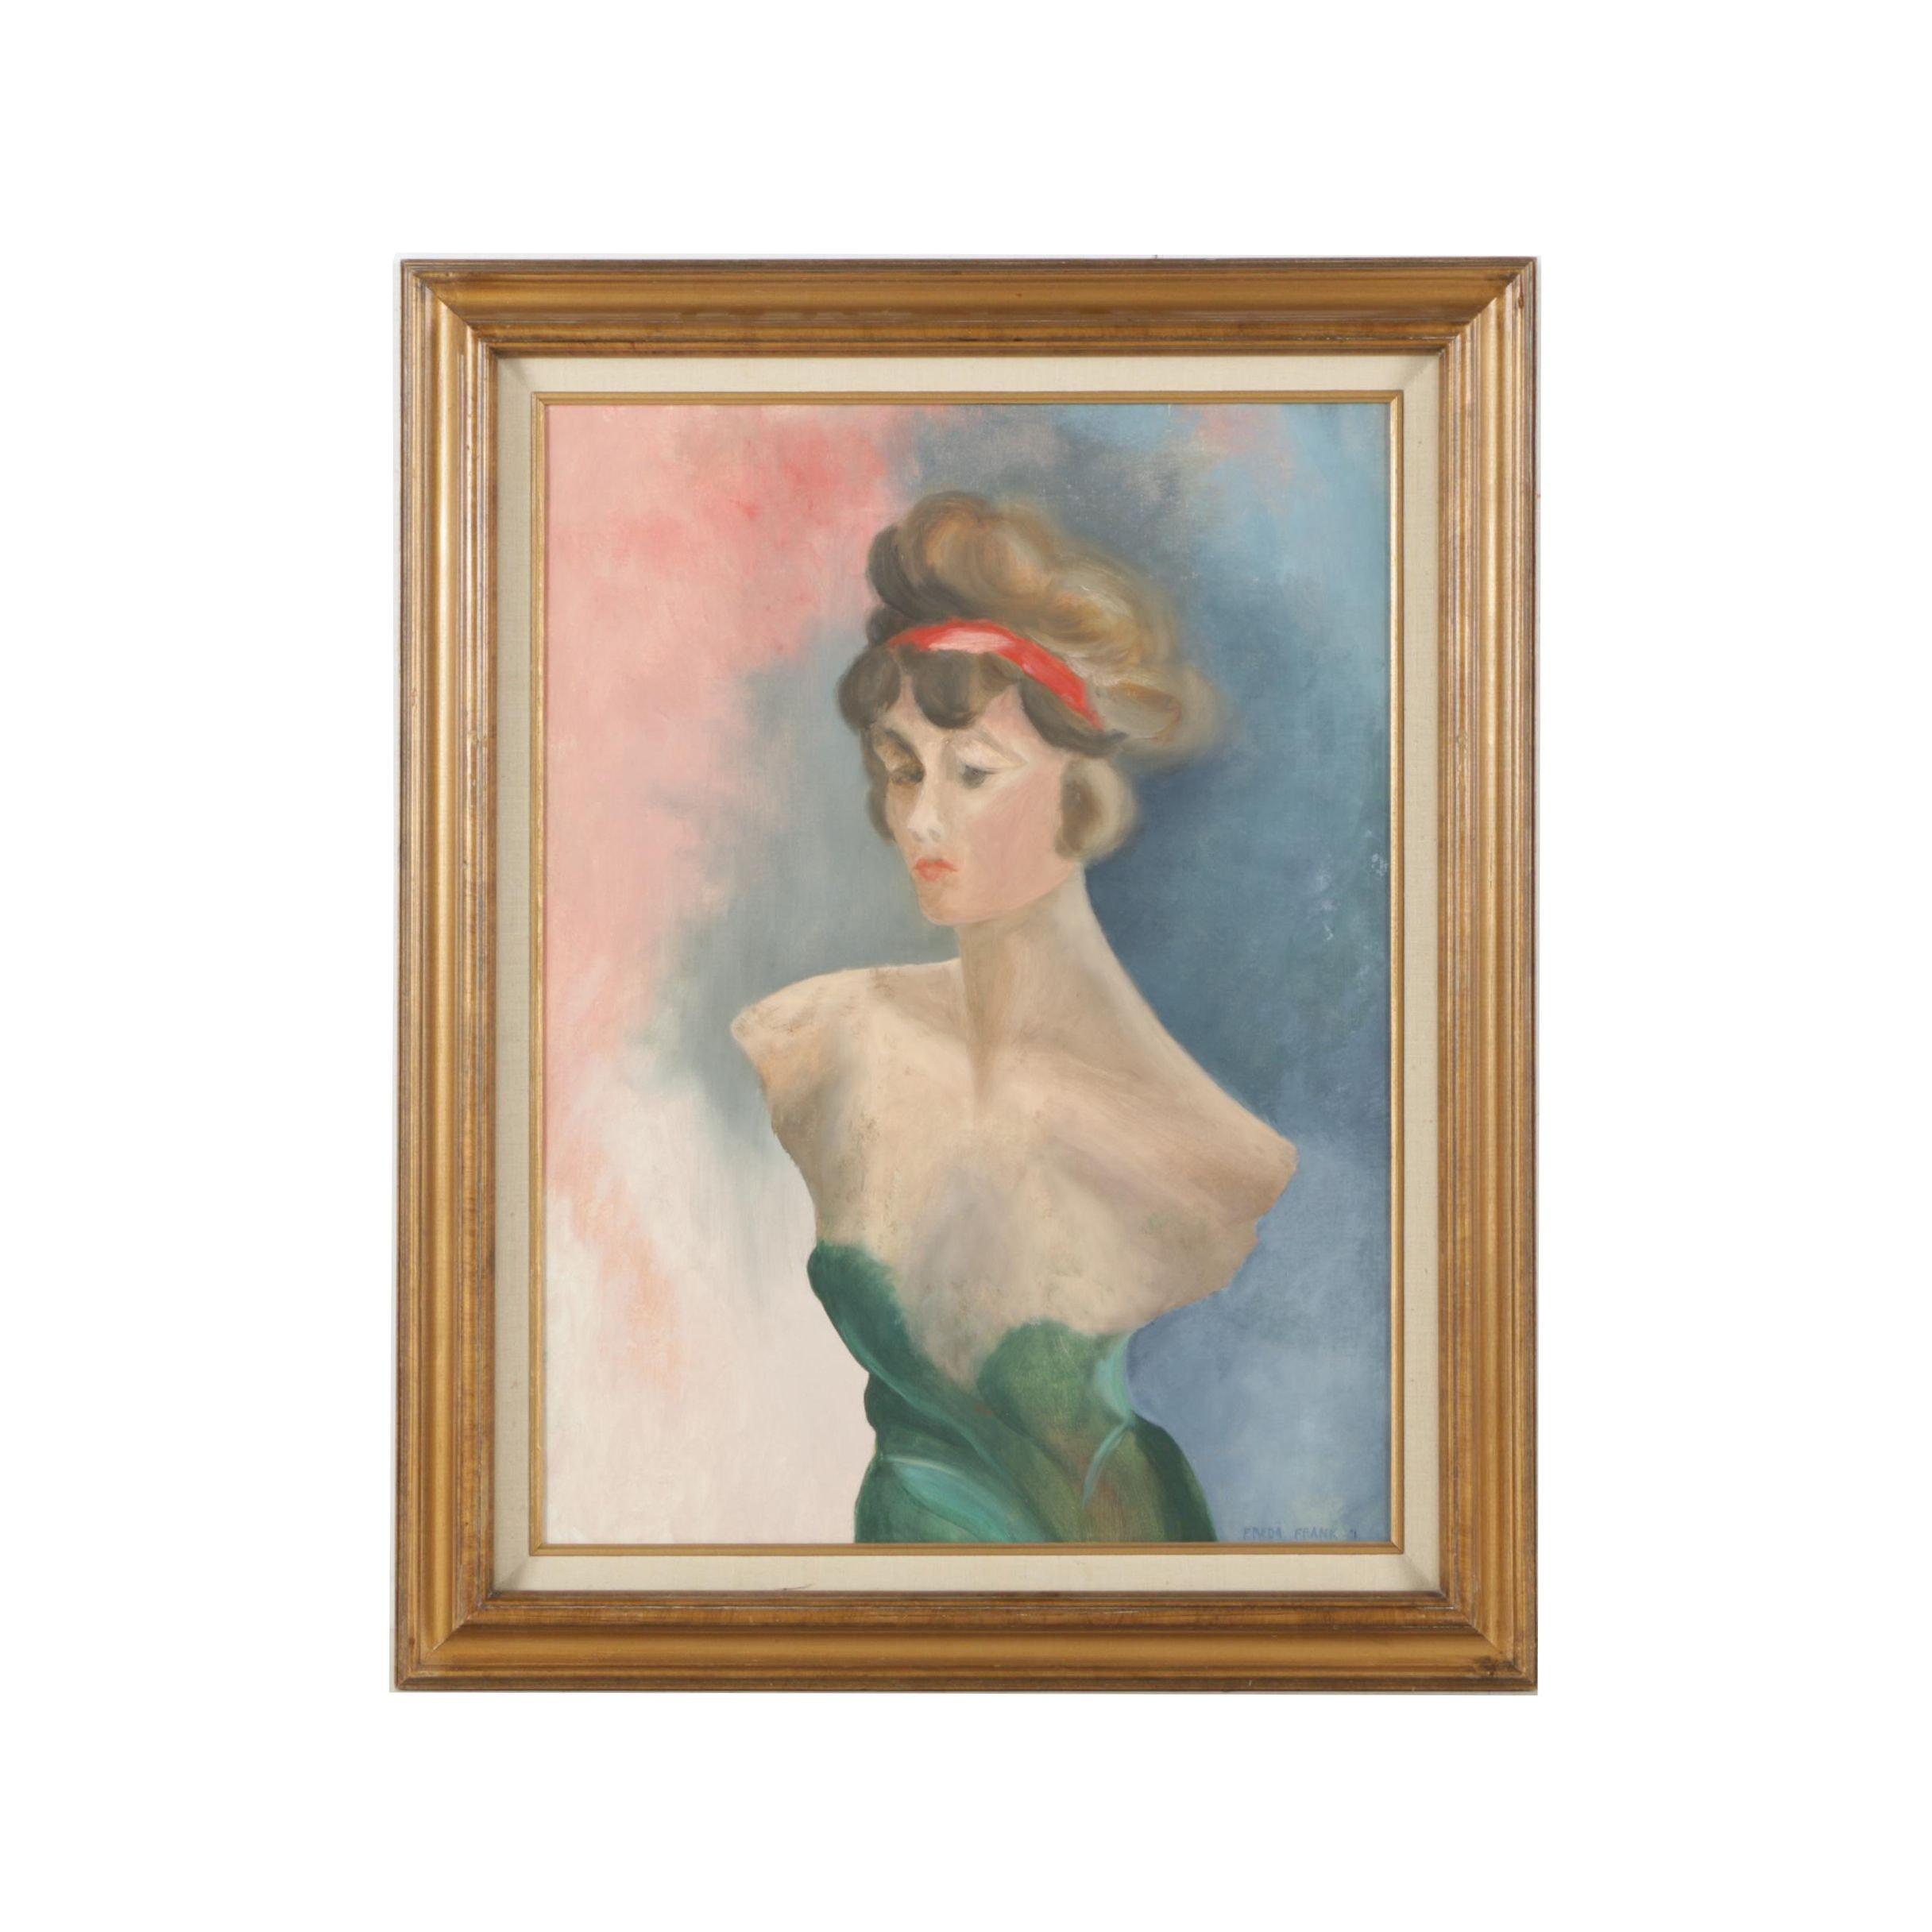 1971 Freda Frank Oil Painting